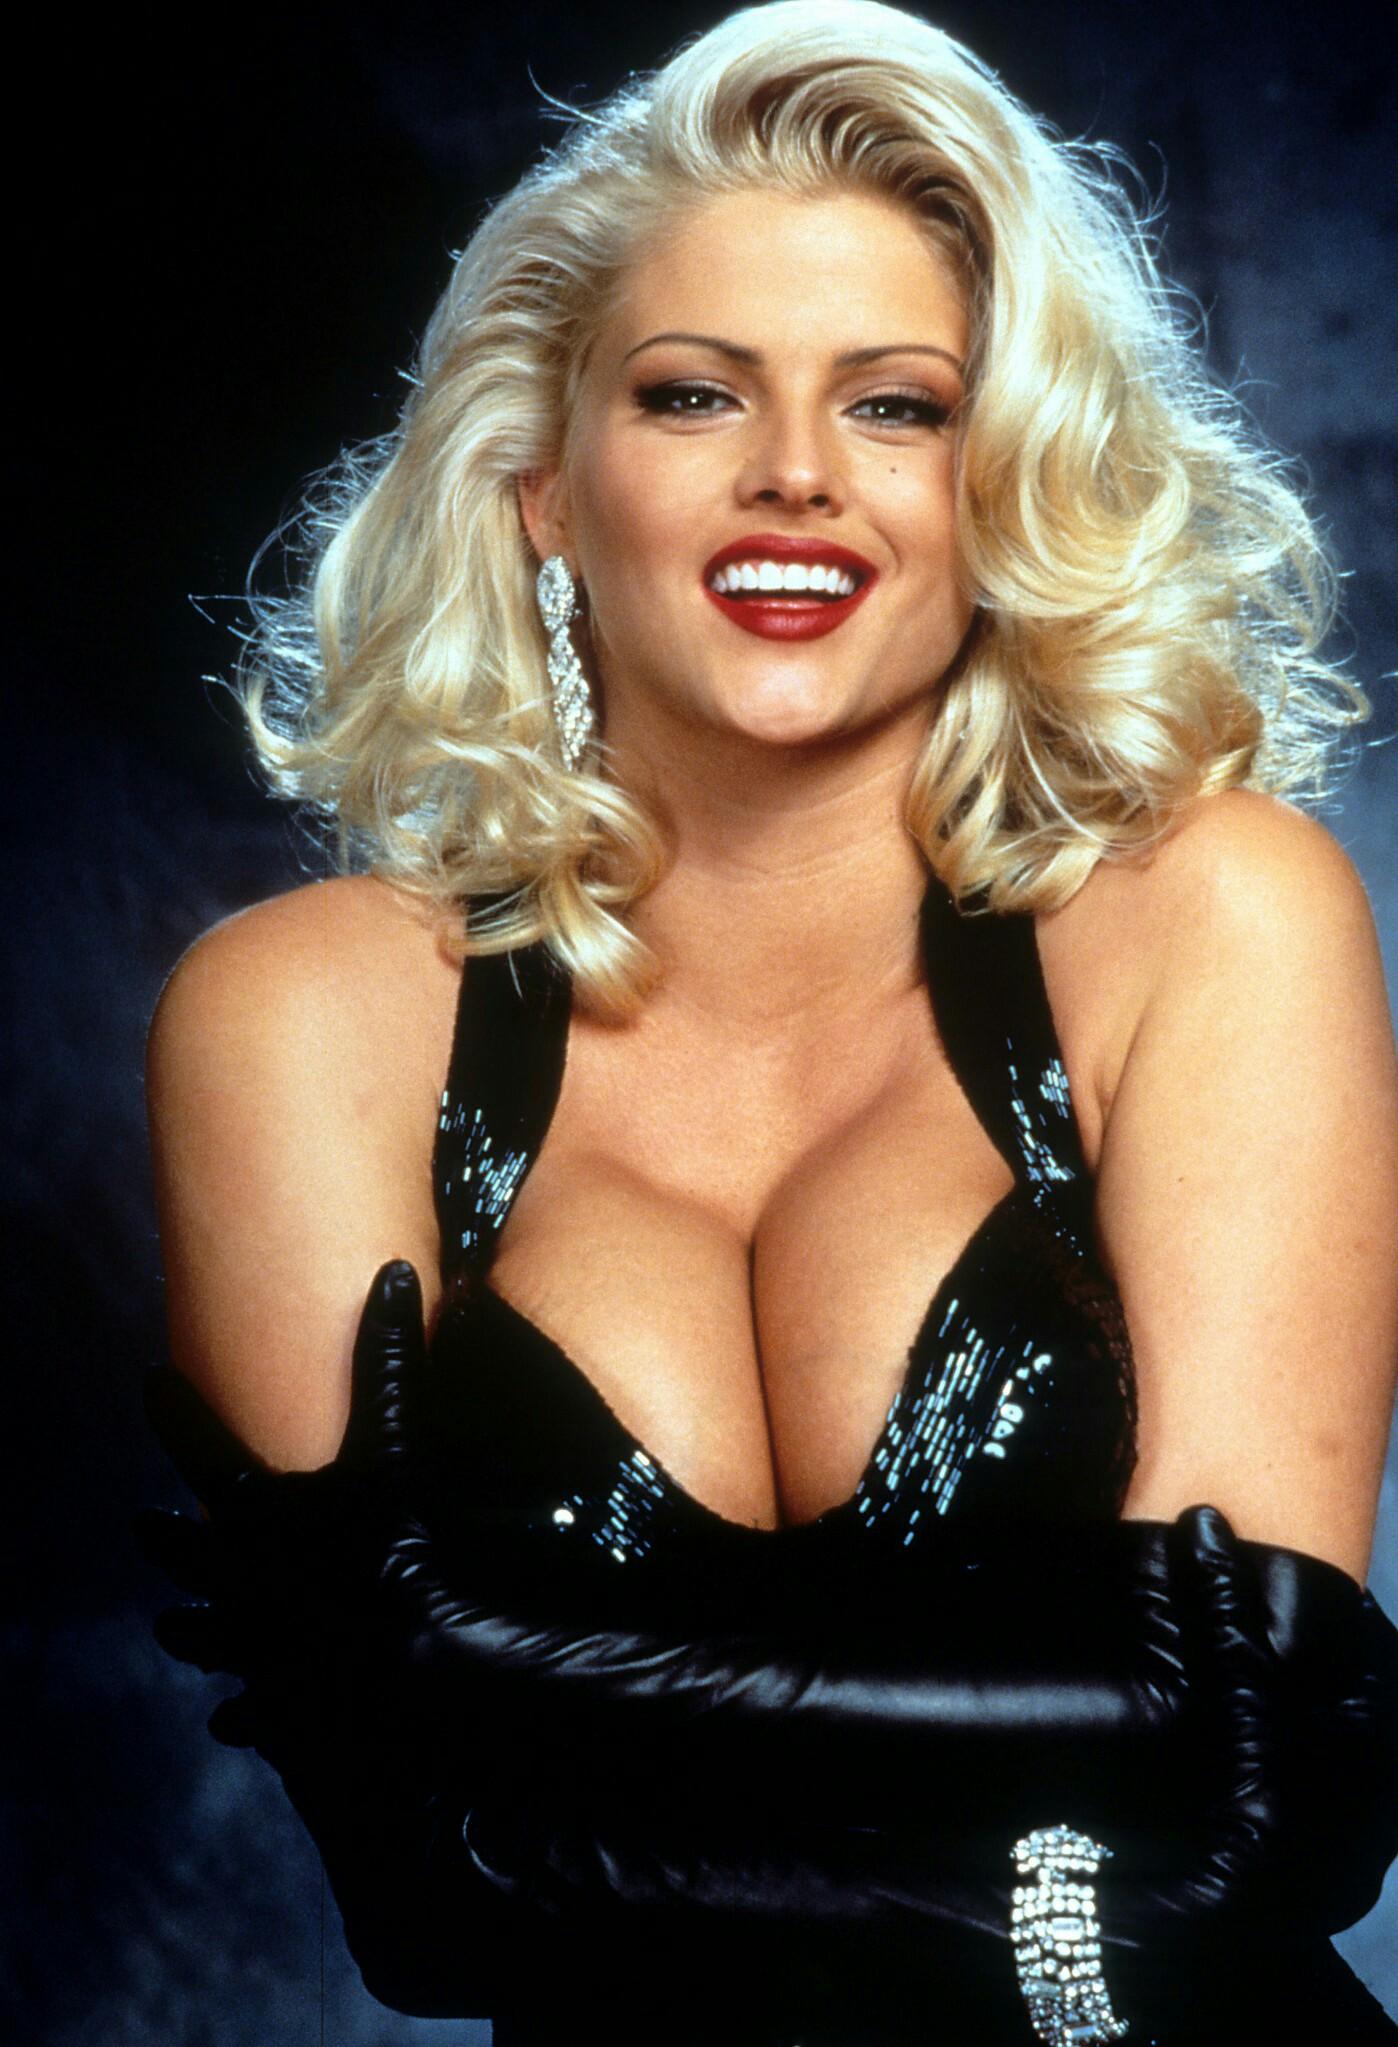 Nicole-Smith-5.jpg